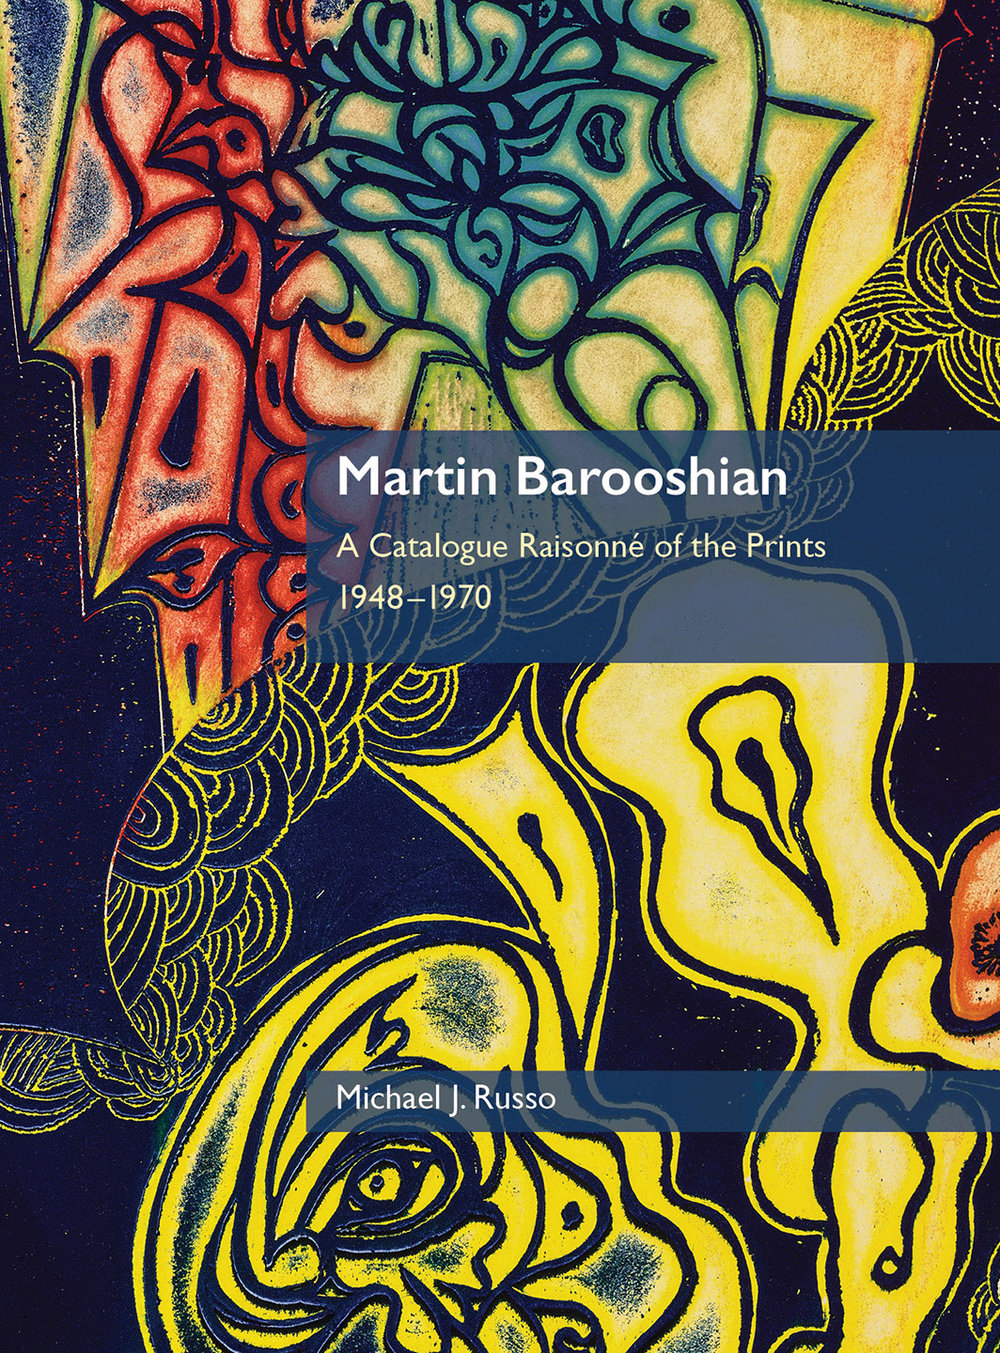 Fine art monograph: Martin Barooshian